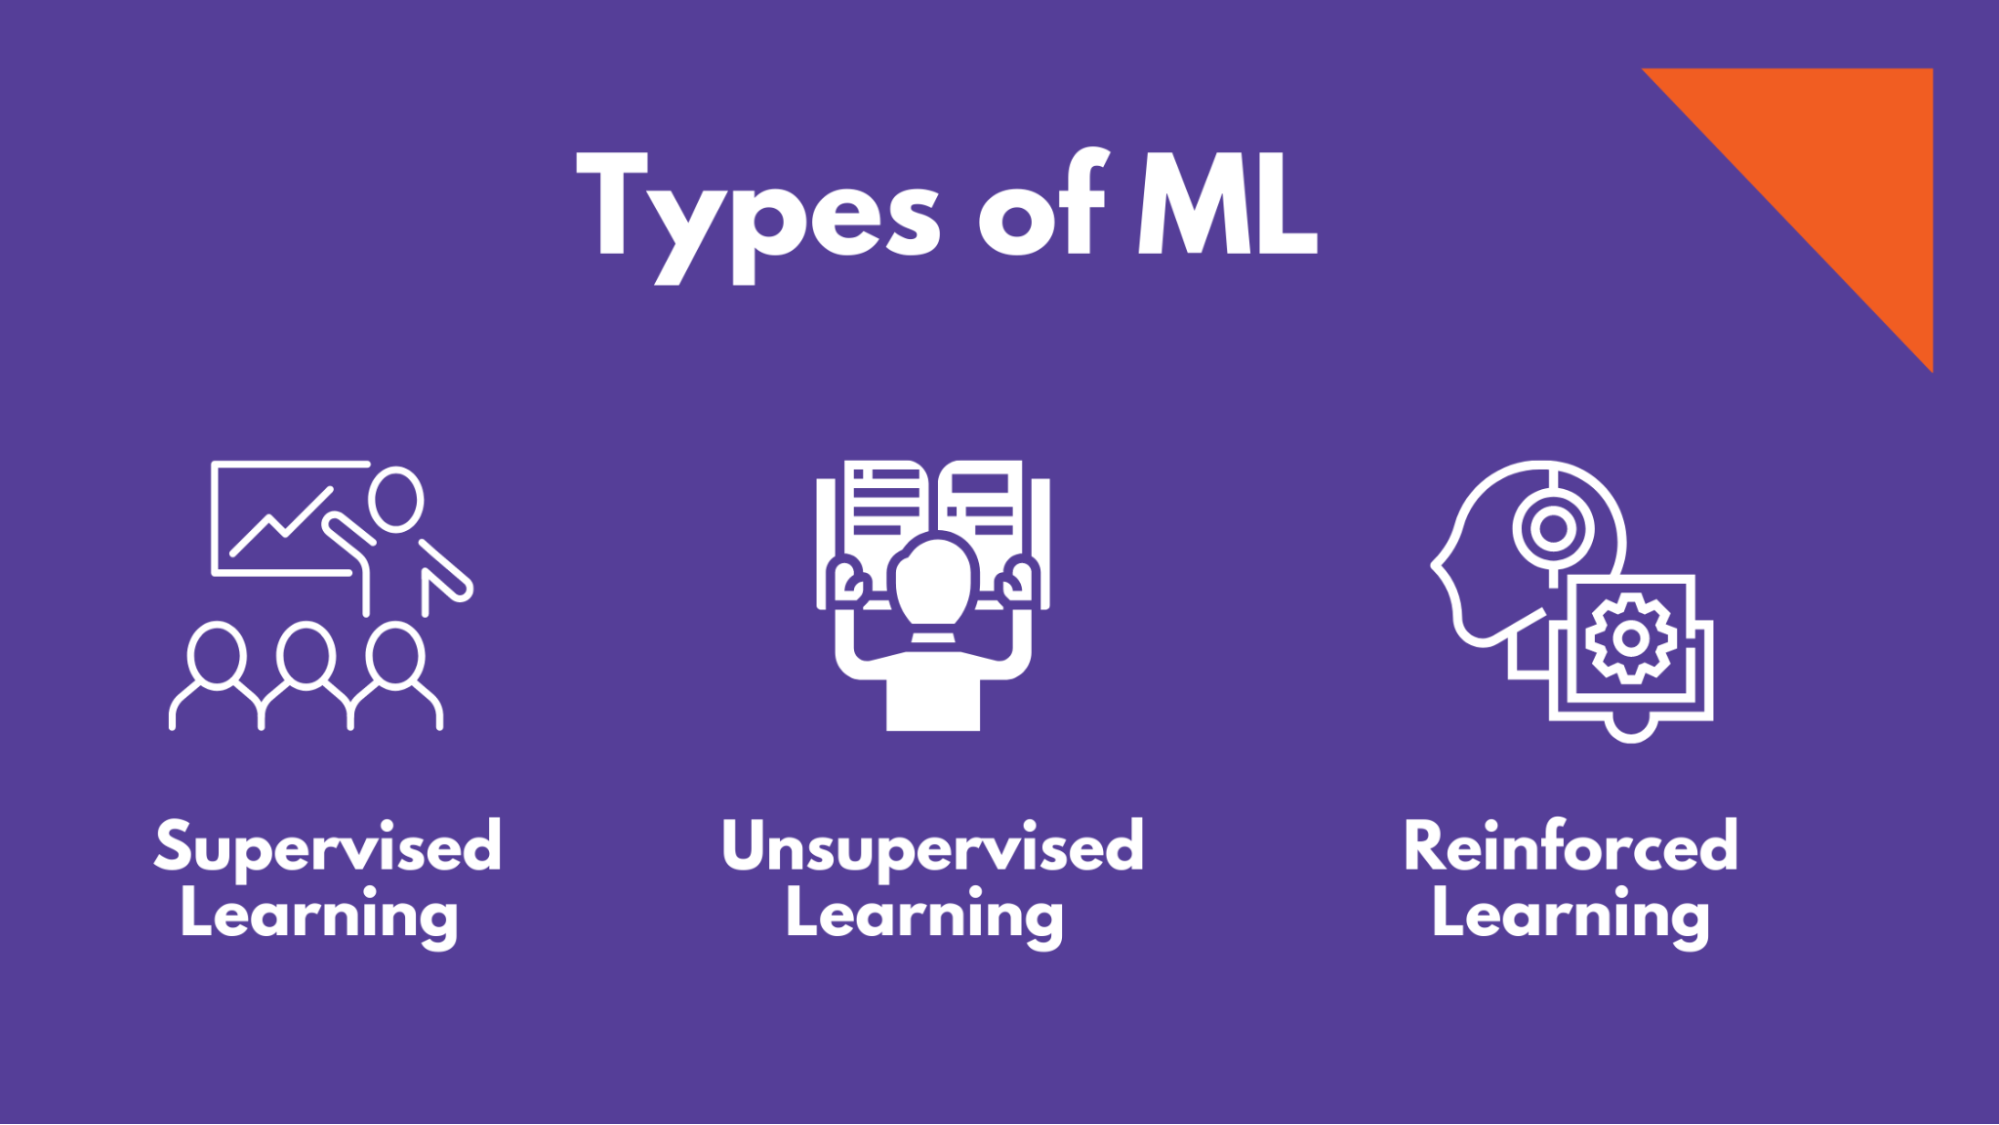 Types of ML